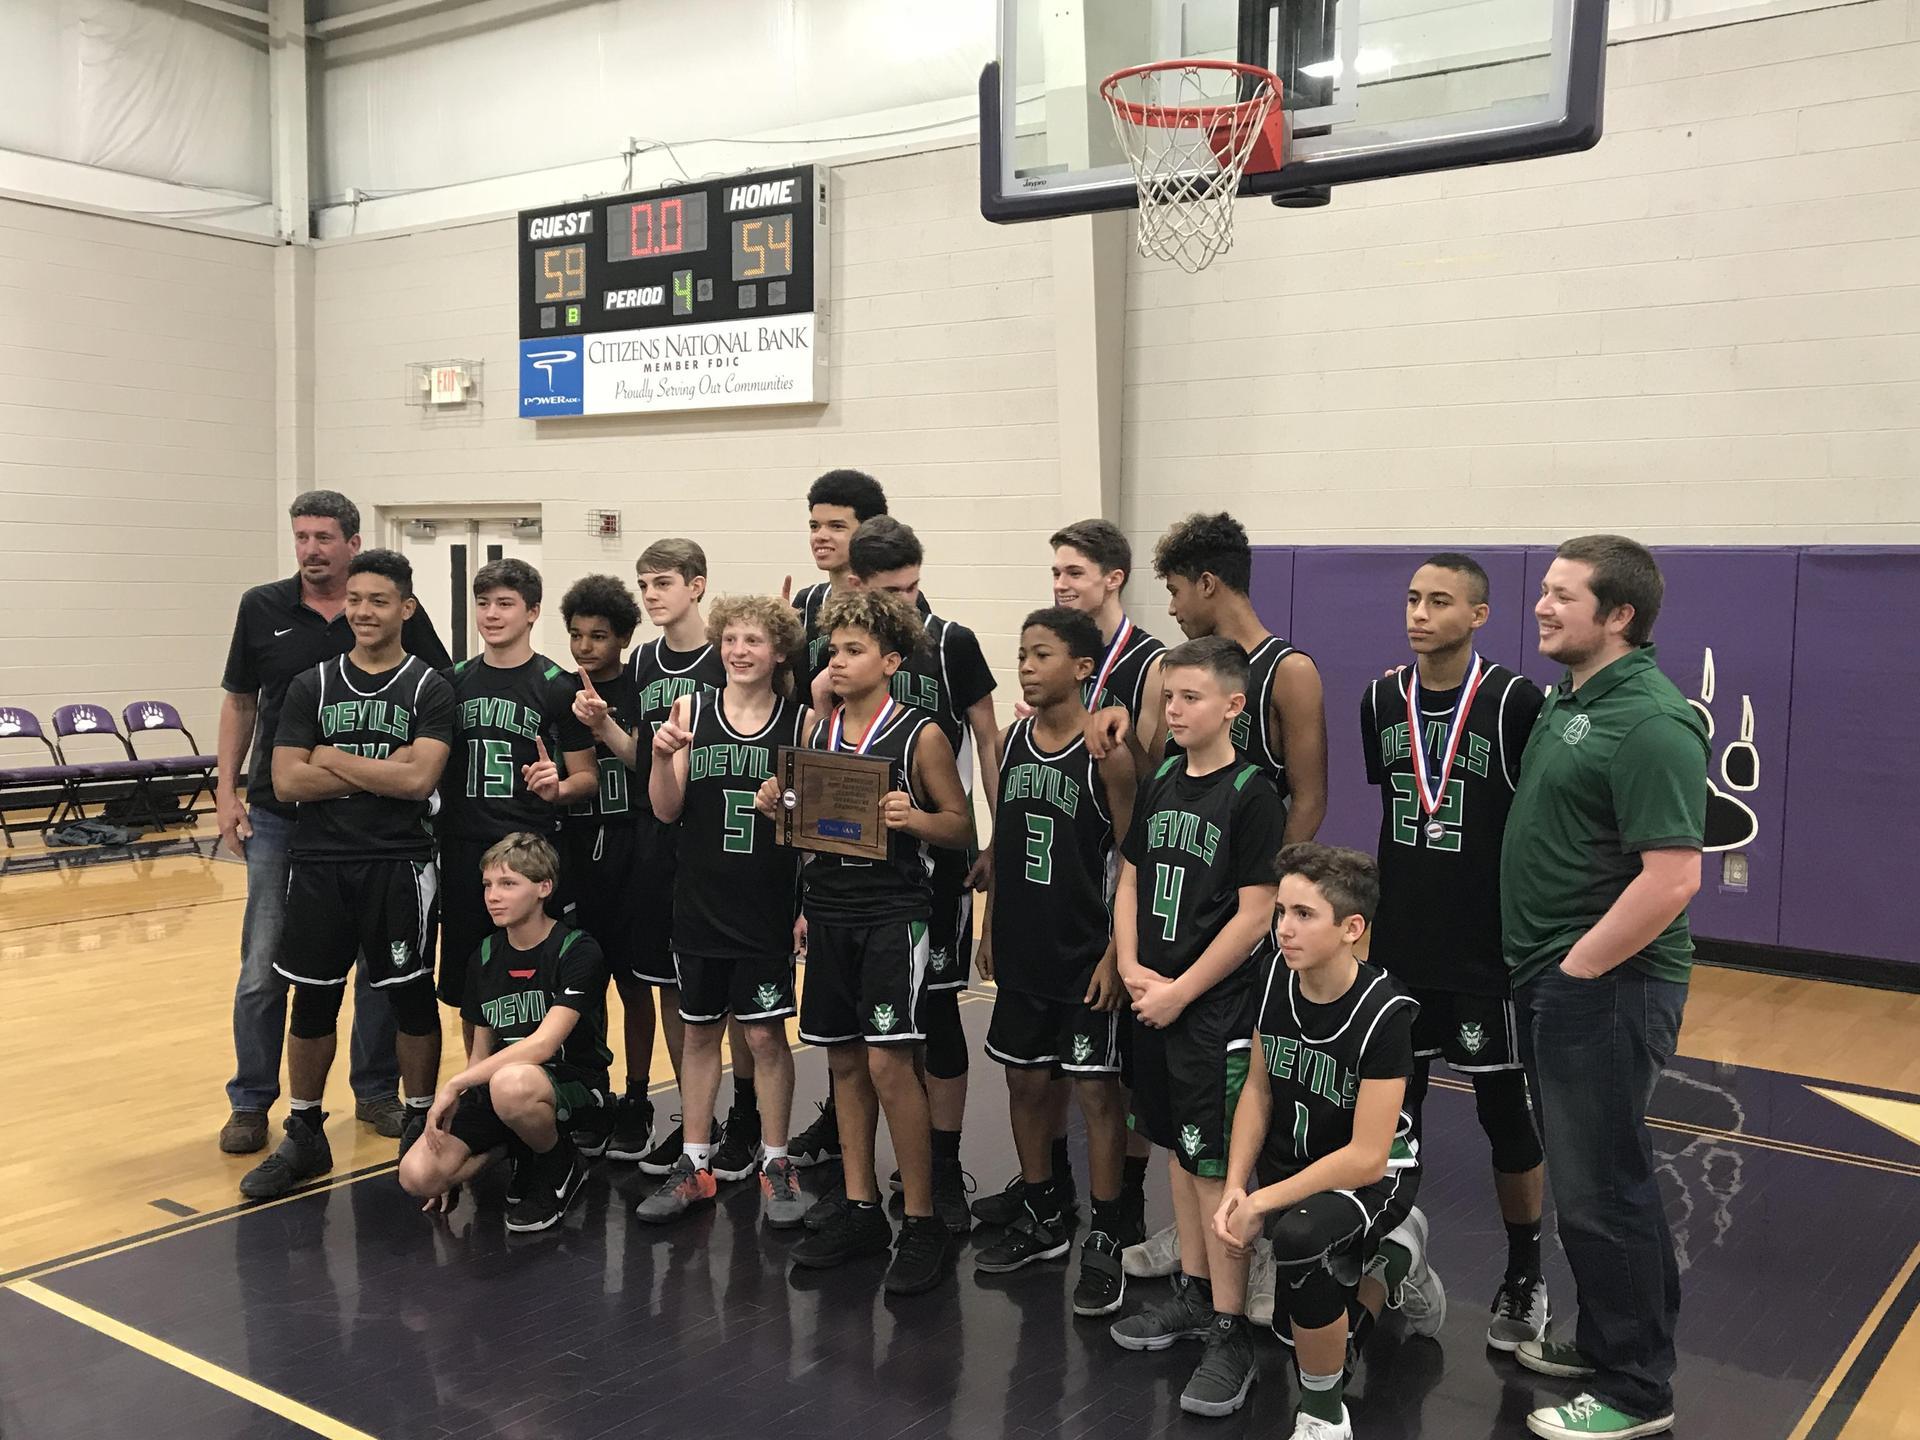 2017-2018 TMSAA AAA Sectional Champions